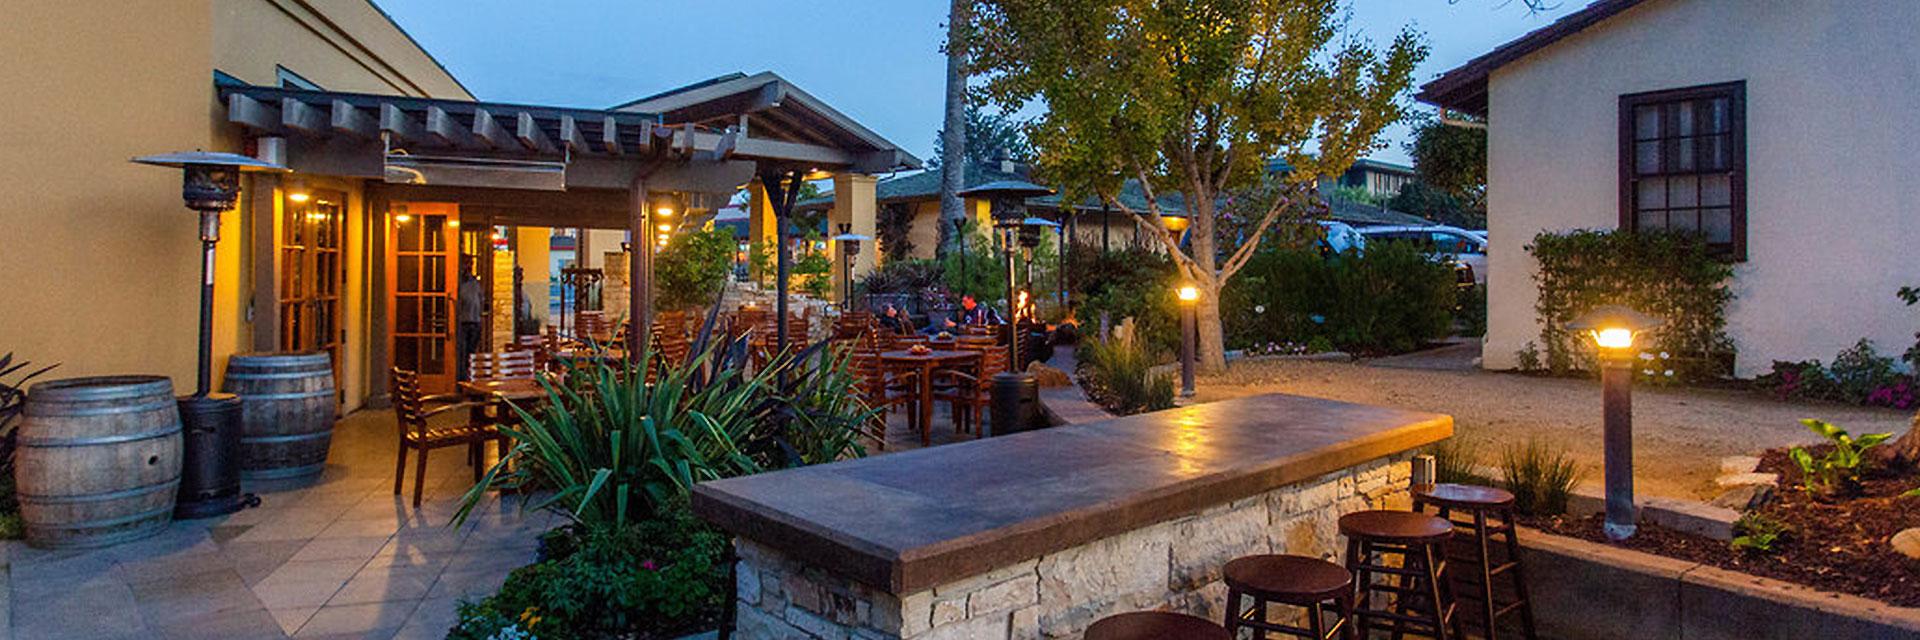 Venues of California Hotel